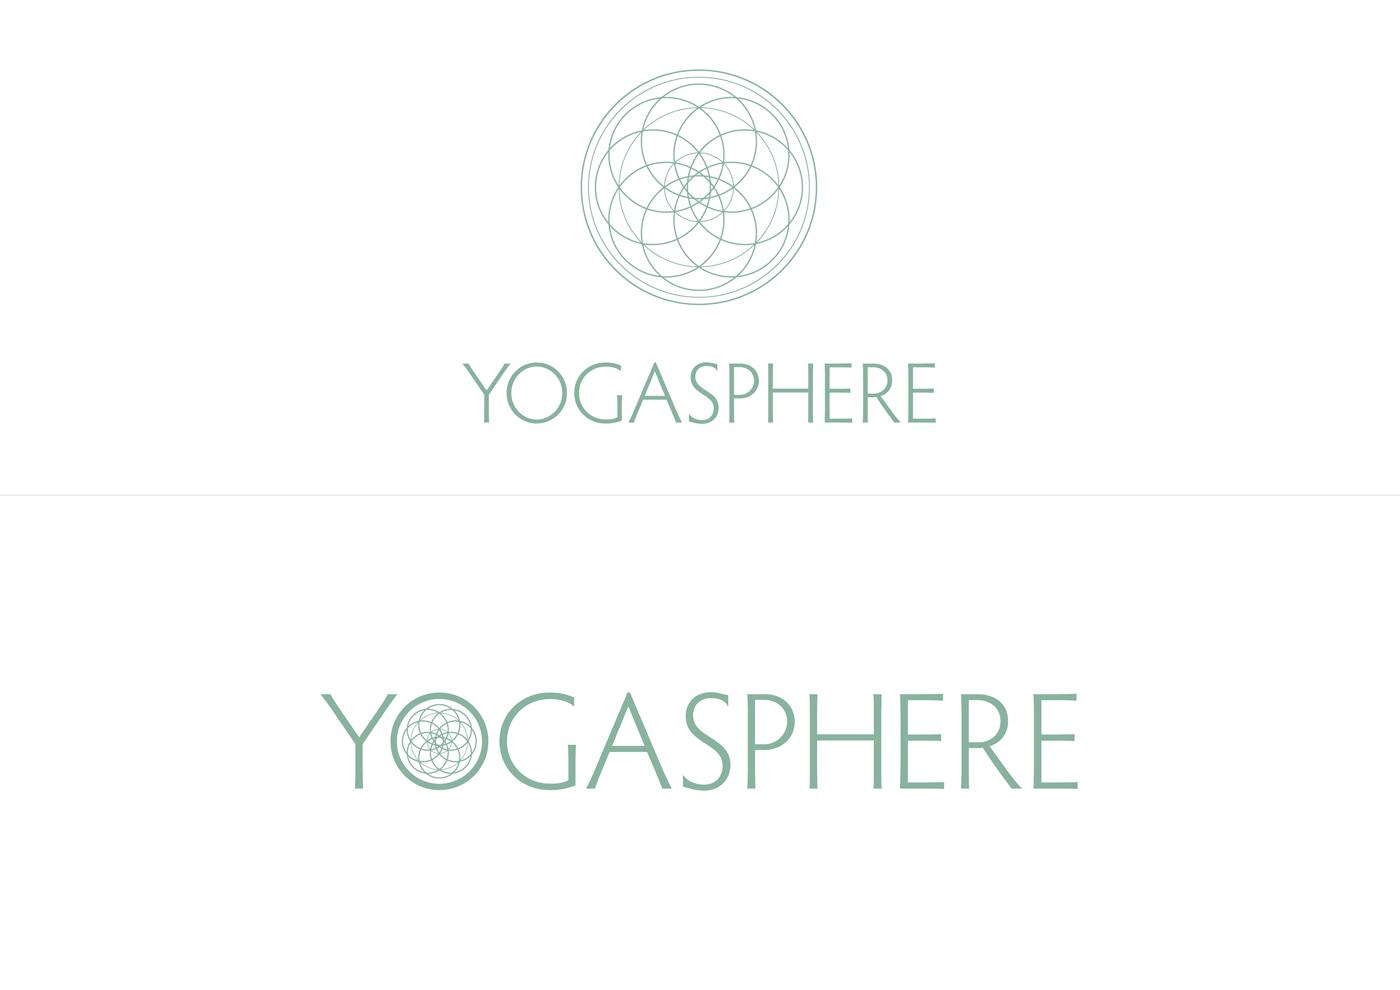 Yogasphere - Teal logo on white background